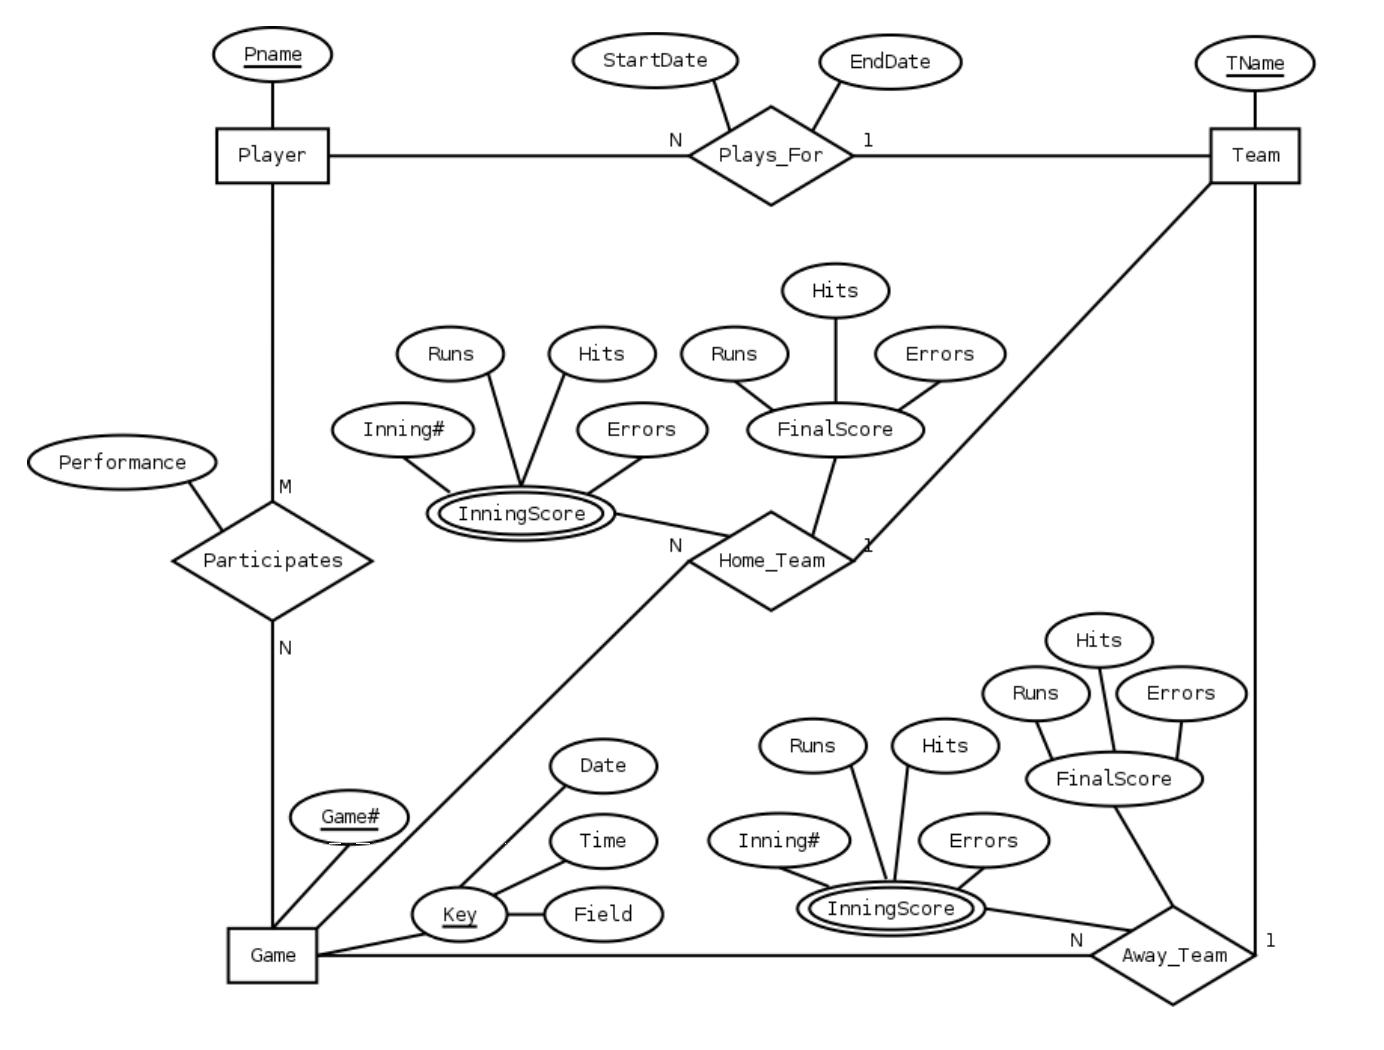 airport er diagram 24v trailer socket wiring uk mysql in erd modeling does a relation map to database